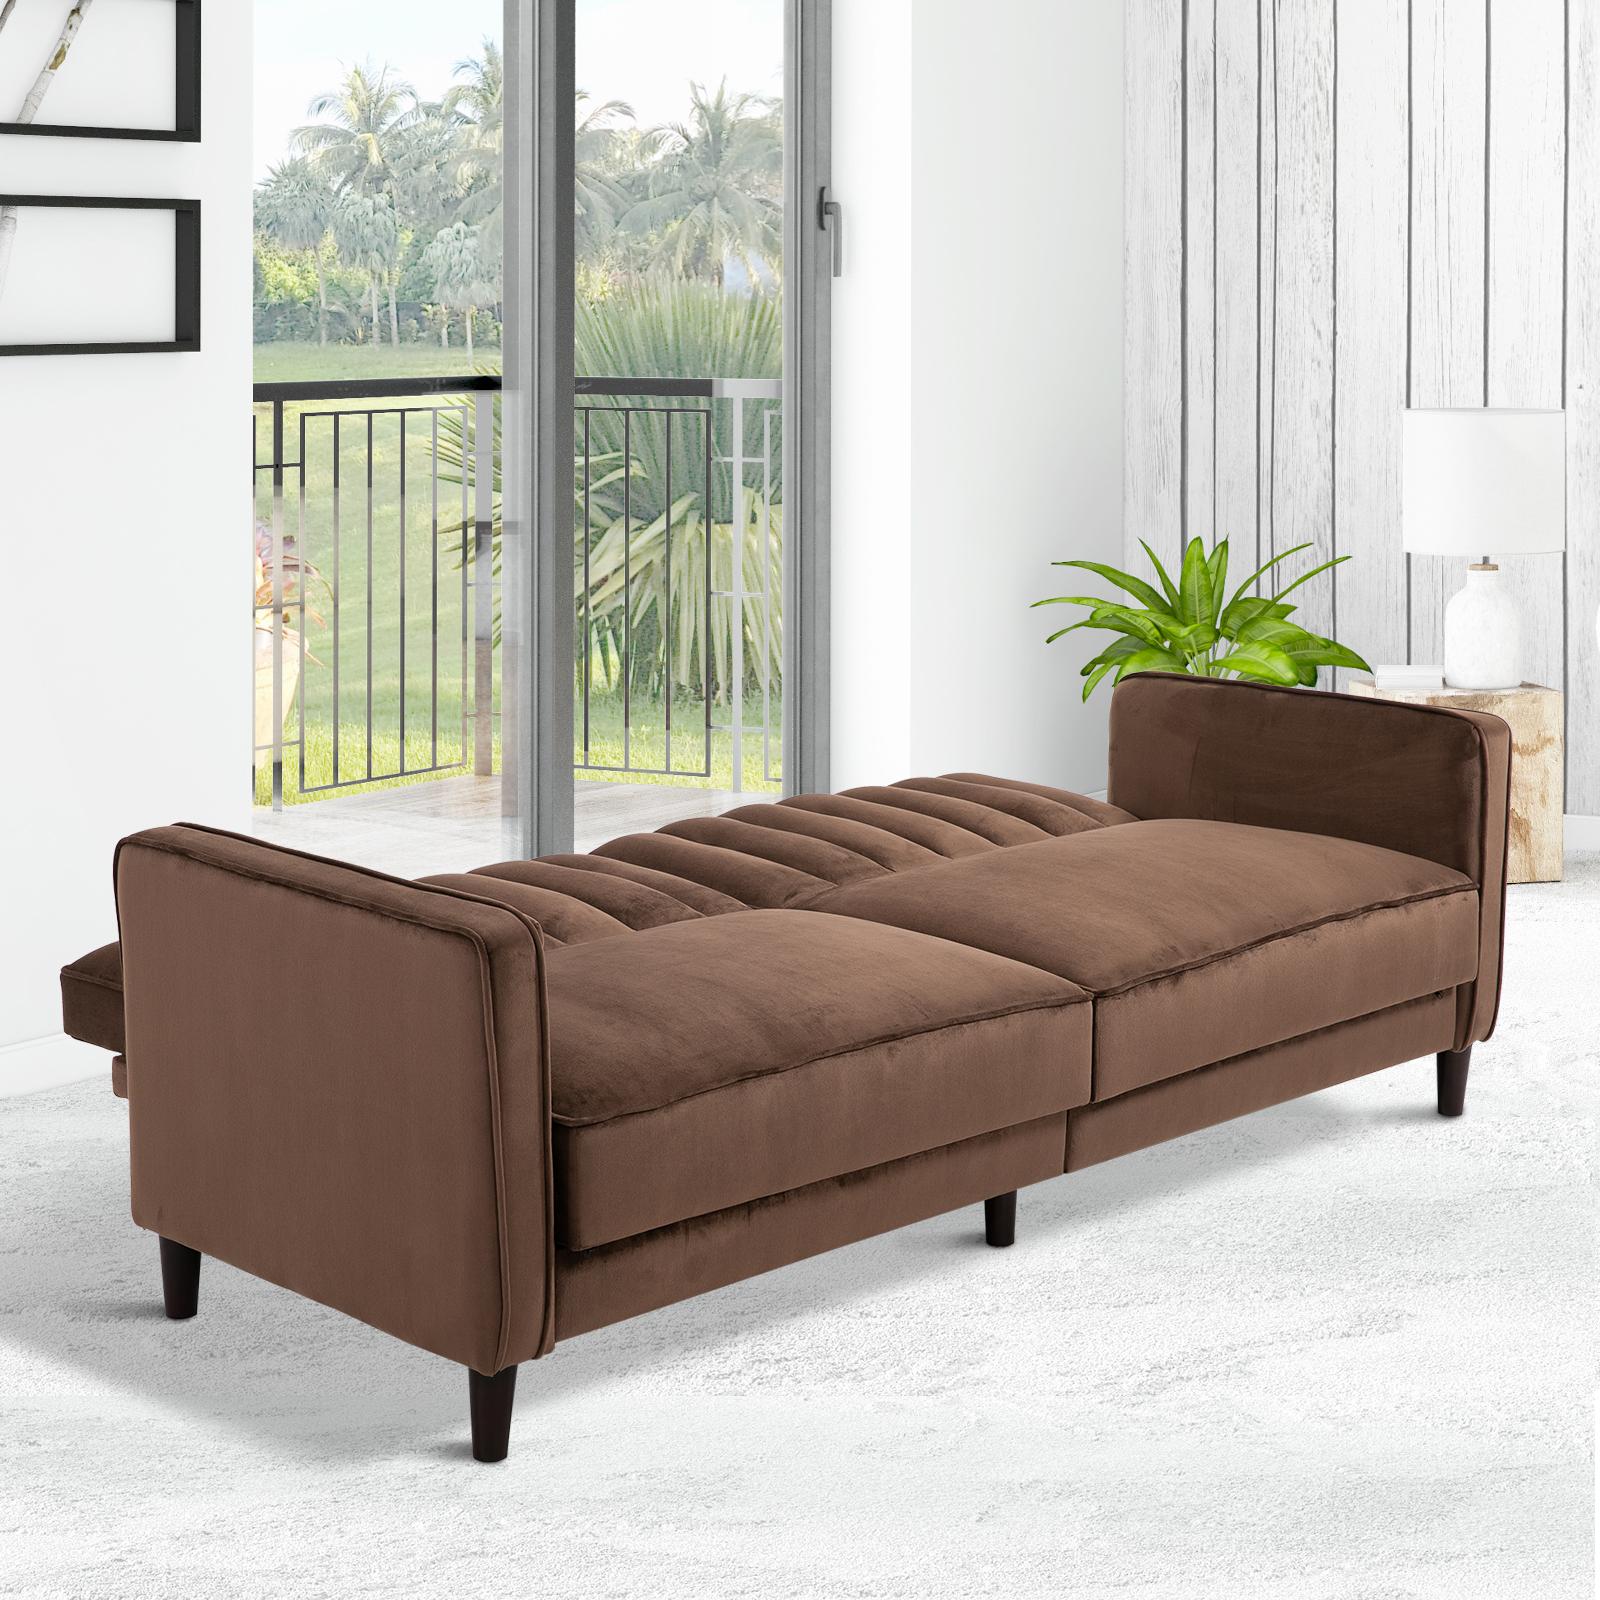 Sofa Bed Recliner Adjustable Back Convertible w/ Cushions ...